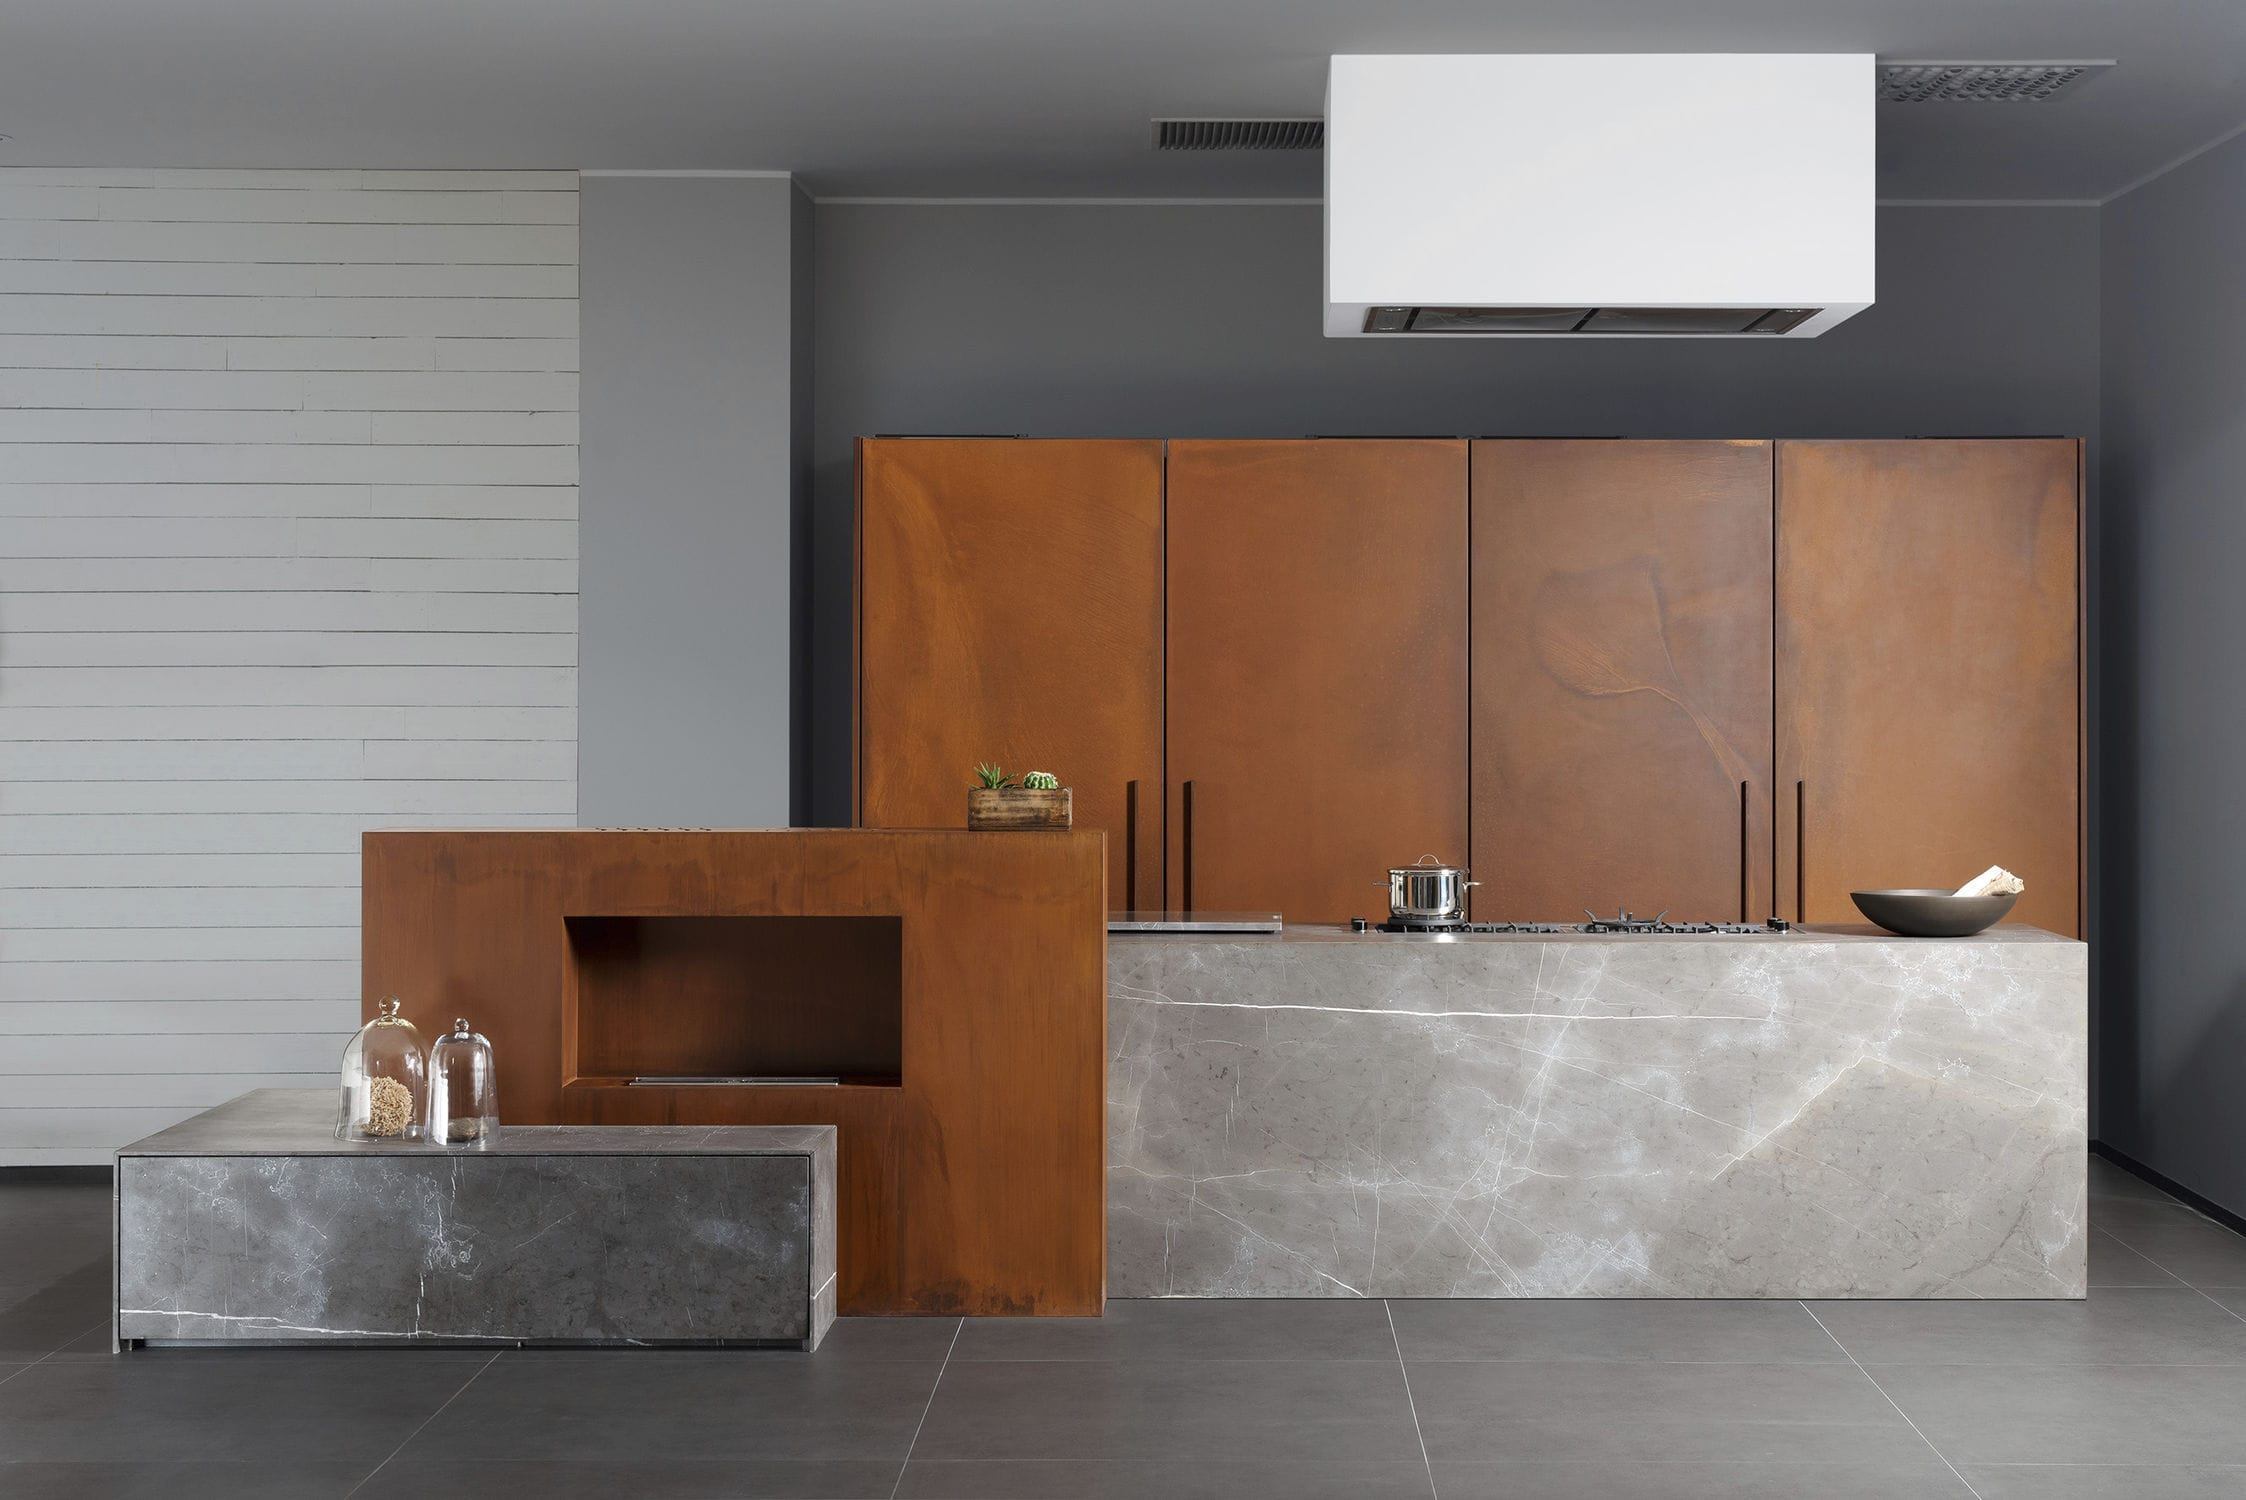 metal kitchen island one handle faucet 现代风格厨房 石材 金属 岛台式 201112 11 d90 pietra di corinto